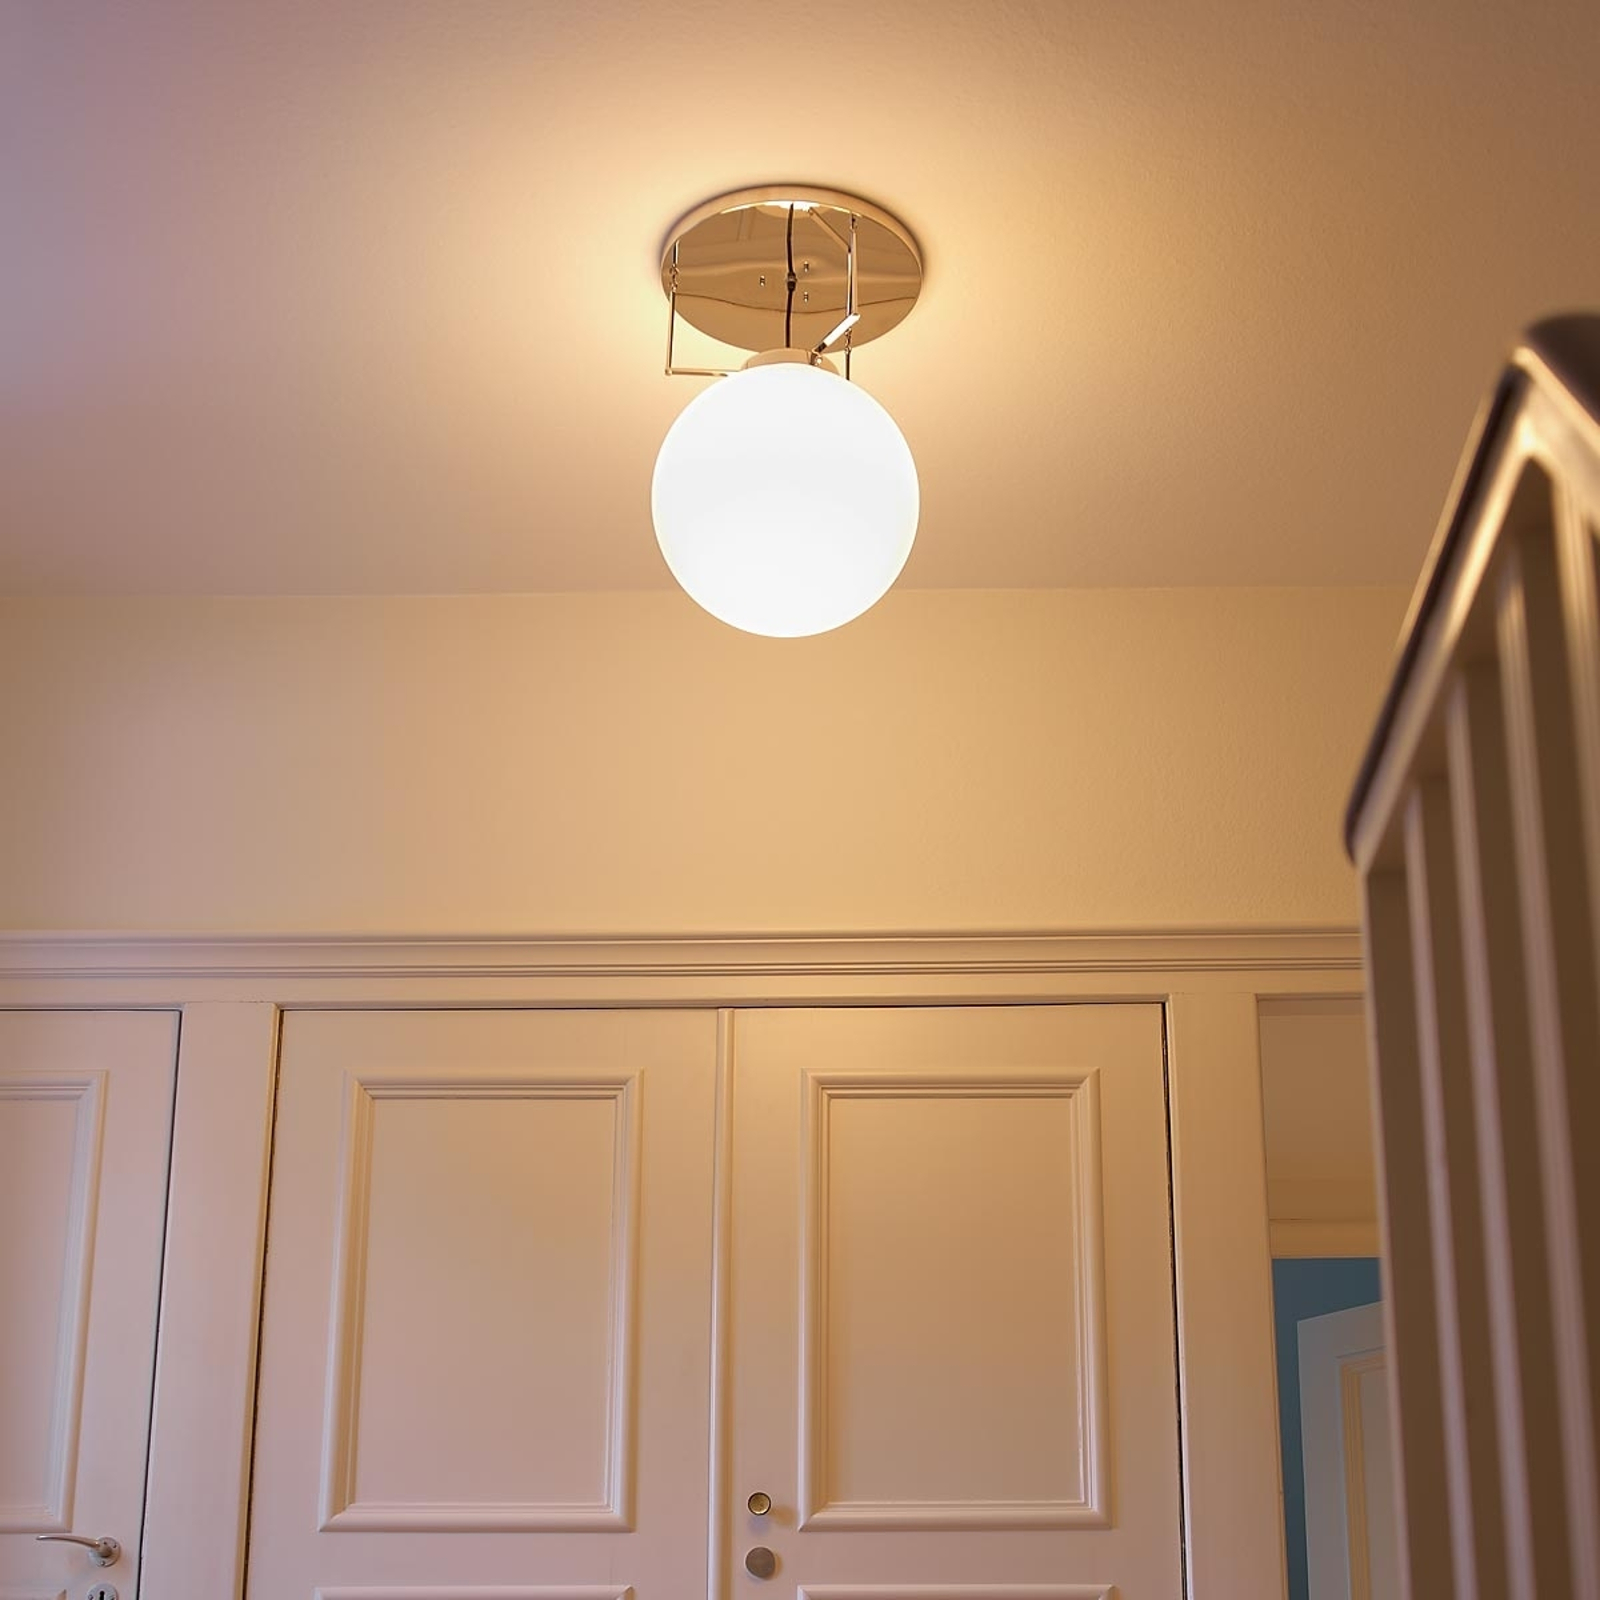 Picture of: Loftlampe Af Messing I Bauhaus Stil Lampegiganten Dk